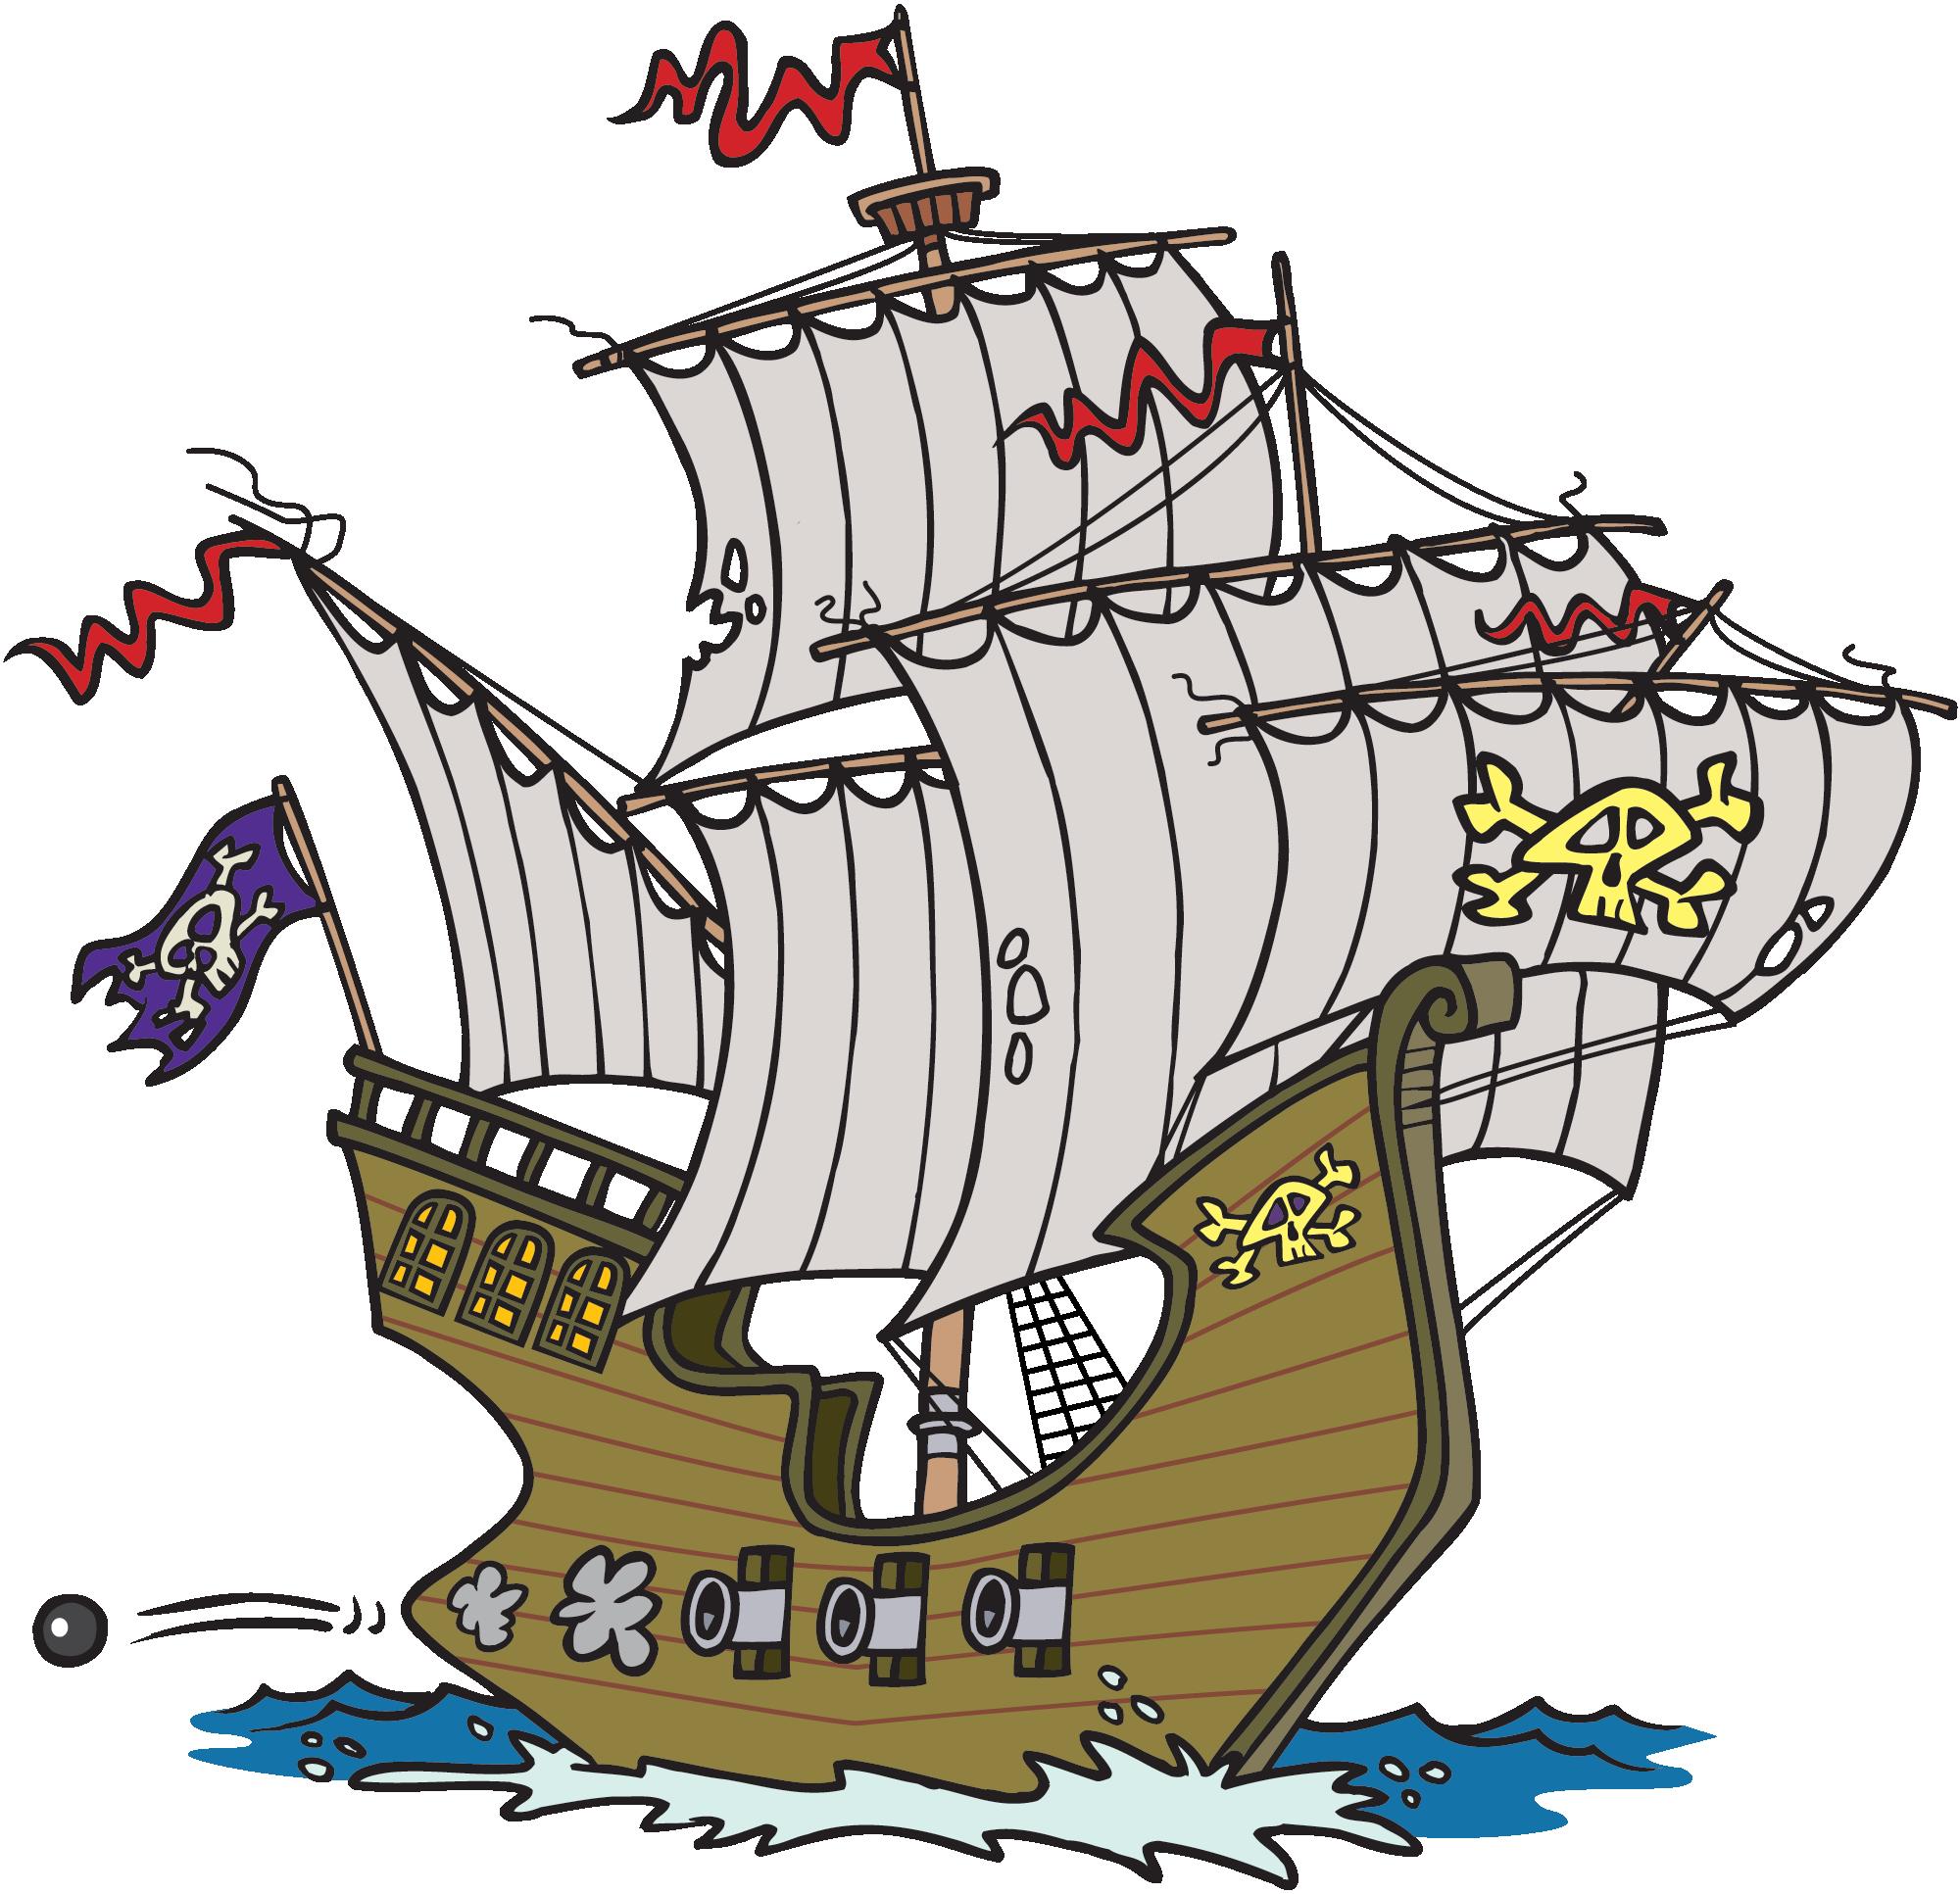 Mayflower clipart sail boat. Cartoon ship pirate rjjnxg